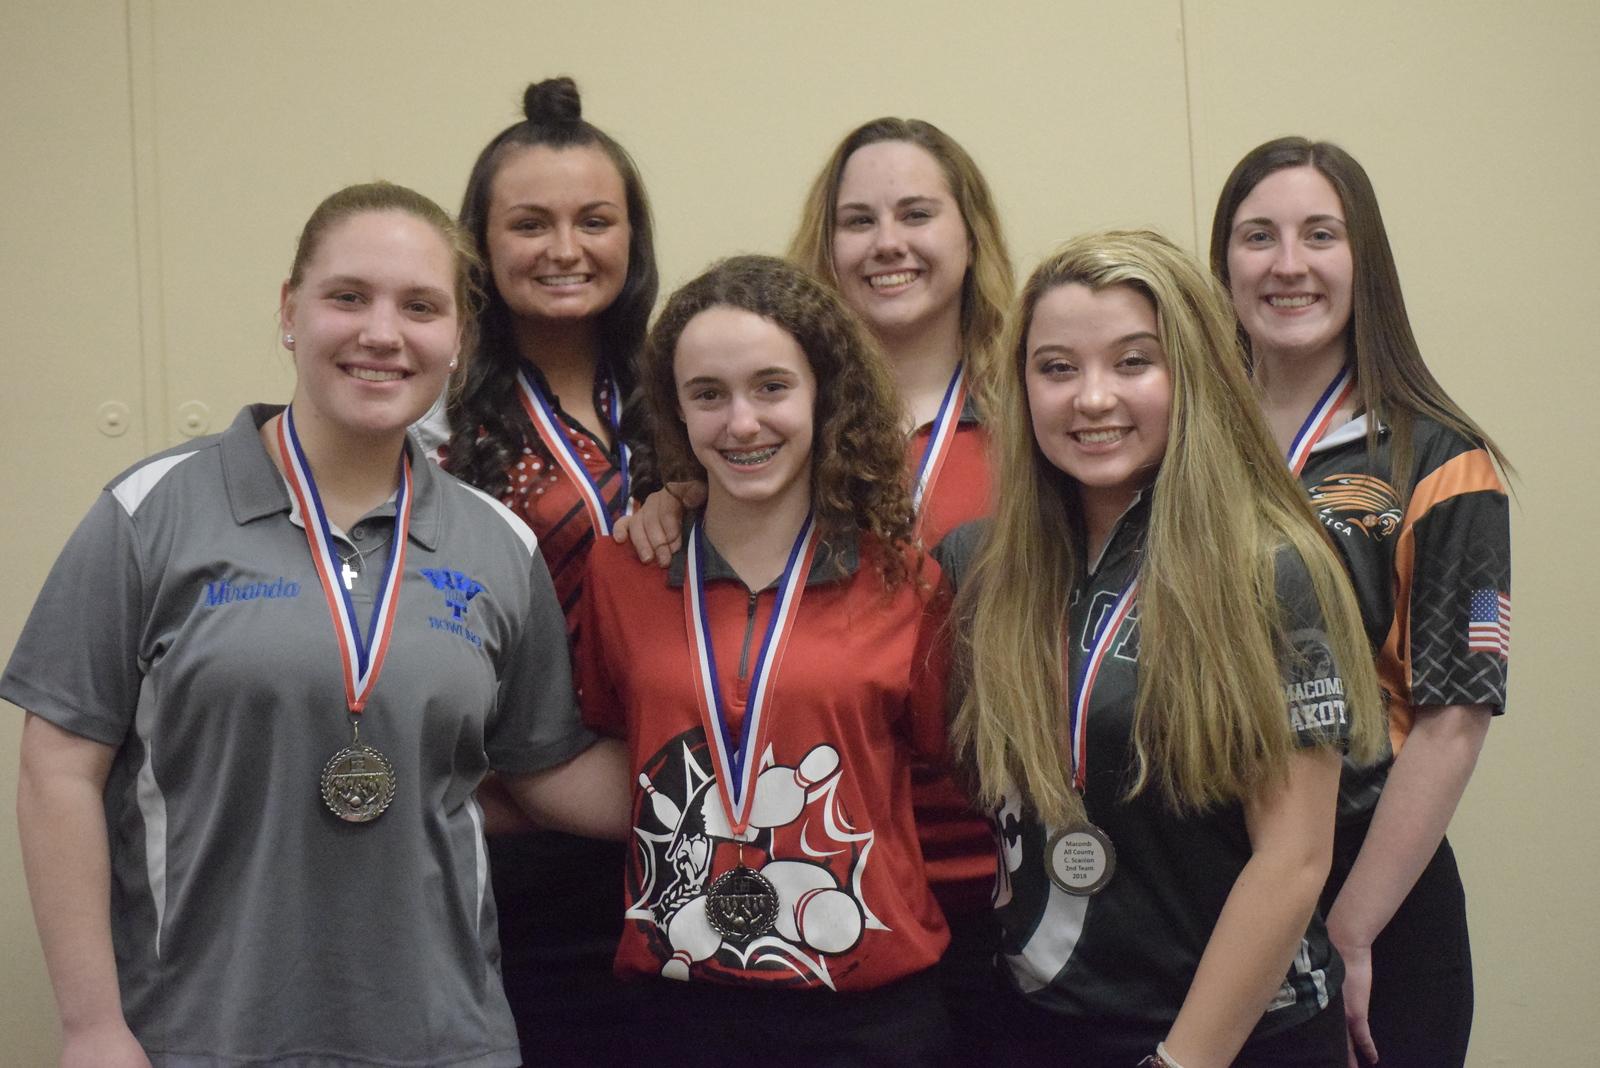 All-Macomb County Second Team, from left, Miranda Walker of Warren Woods-Tower, Danielle Seaman of Anchor Bay, Danella DeCruydt of Lake Shore, Jessica Ludwick of Lake Shore, Carly Scanlon of Dakota and Sydney Clark of Utica.